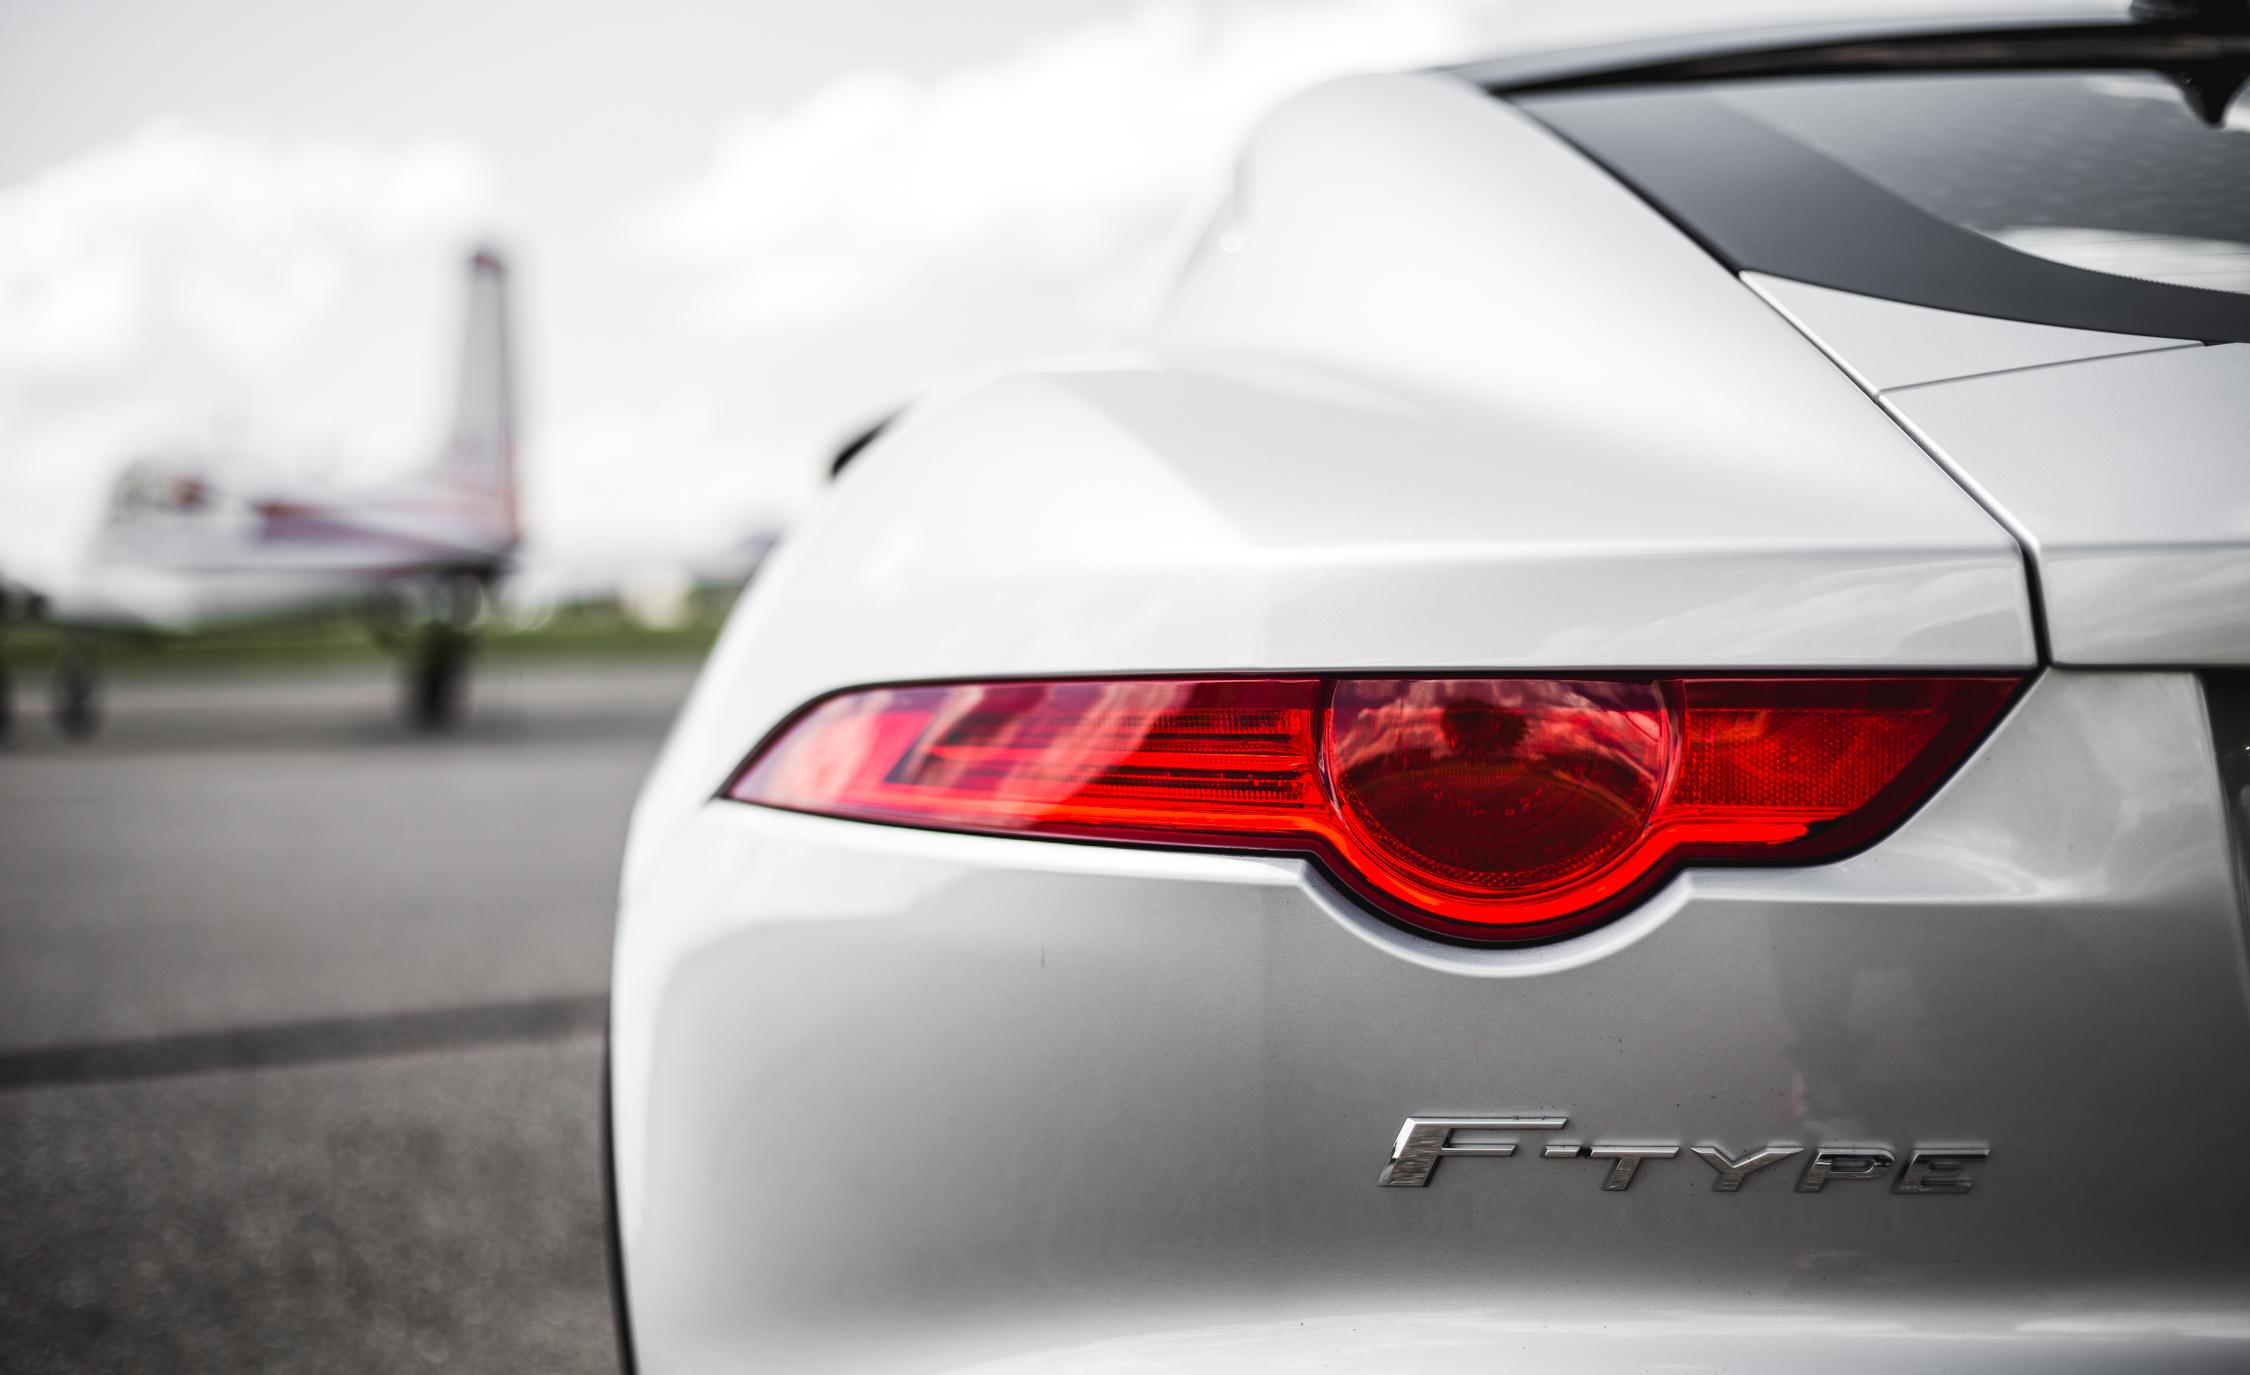 2016 Jaguar F-Type S Exterior Taillight